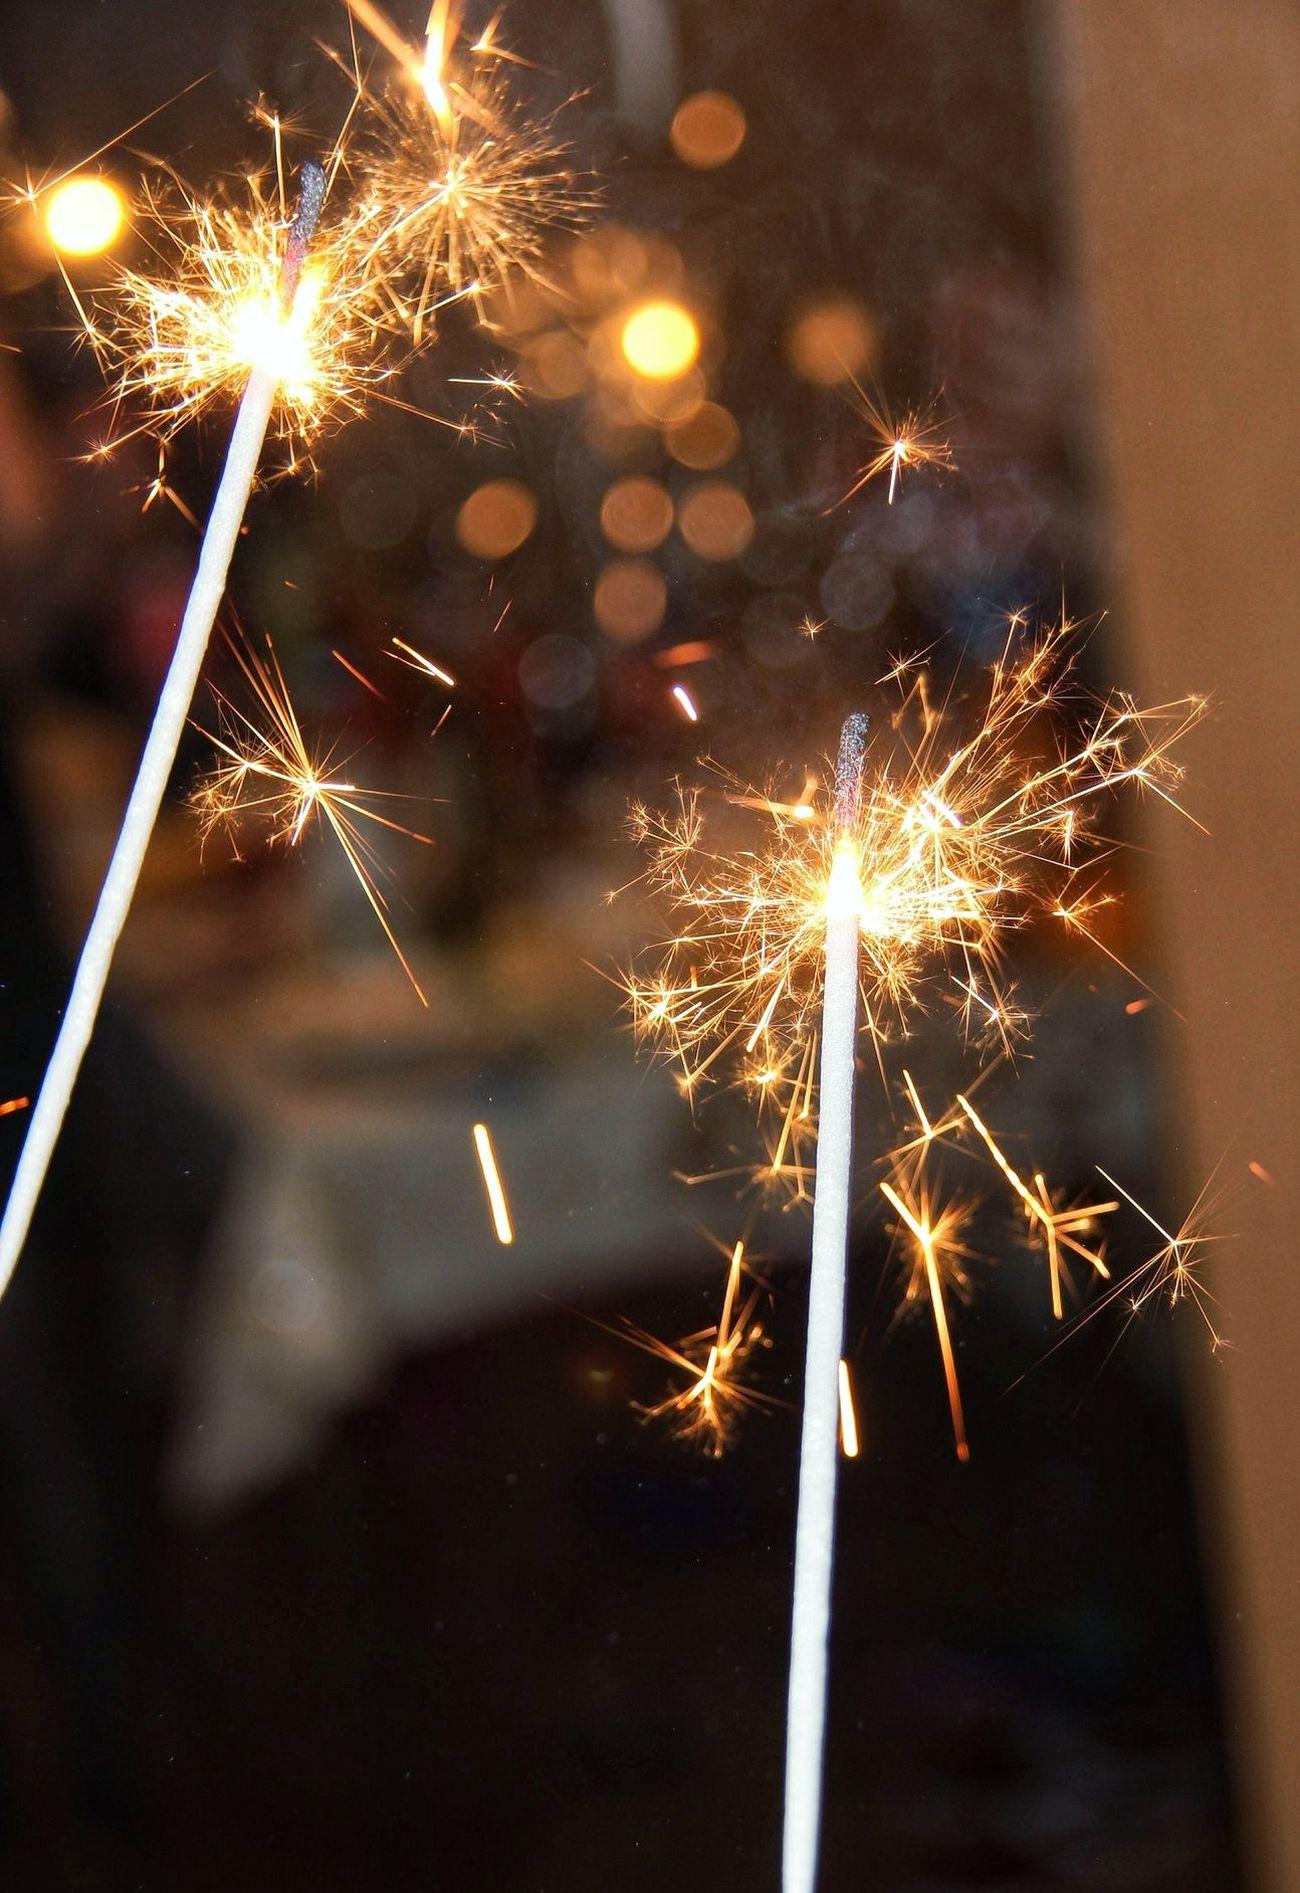 Sparklers Bengal Fire Photo Day NewYear Celebration Ukraine Beautiful Kiev Party Canon